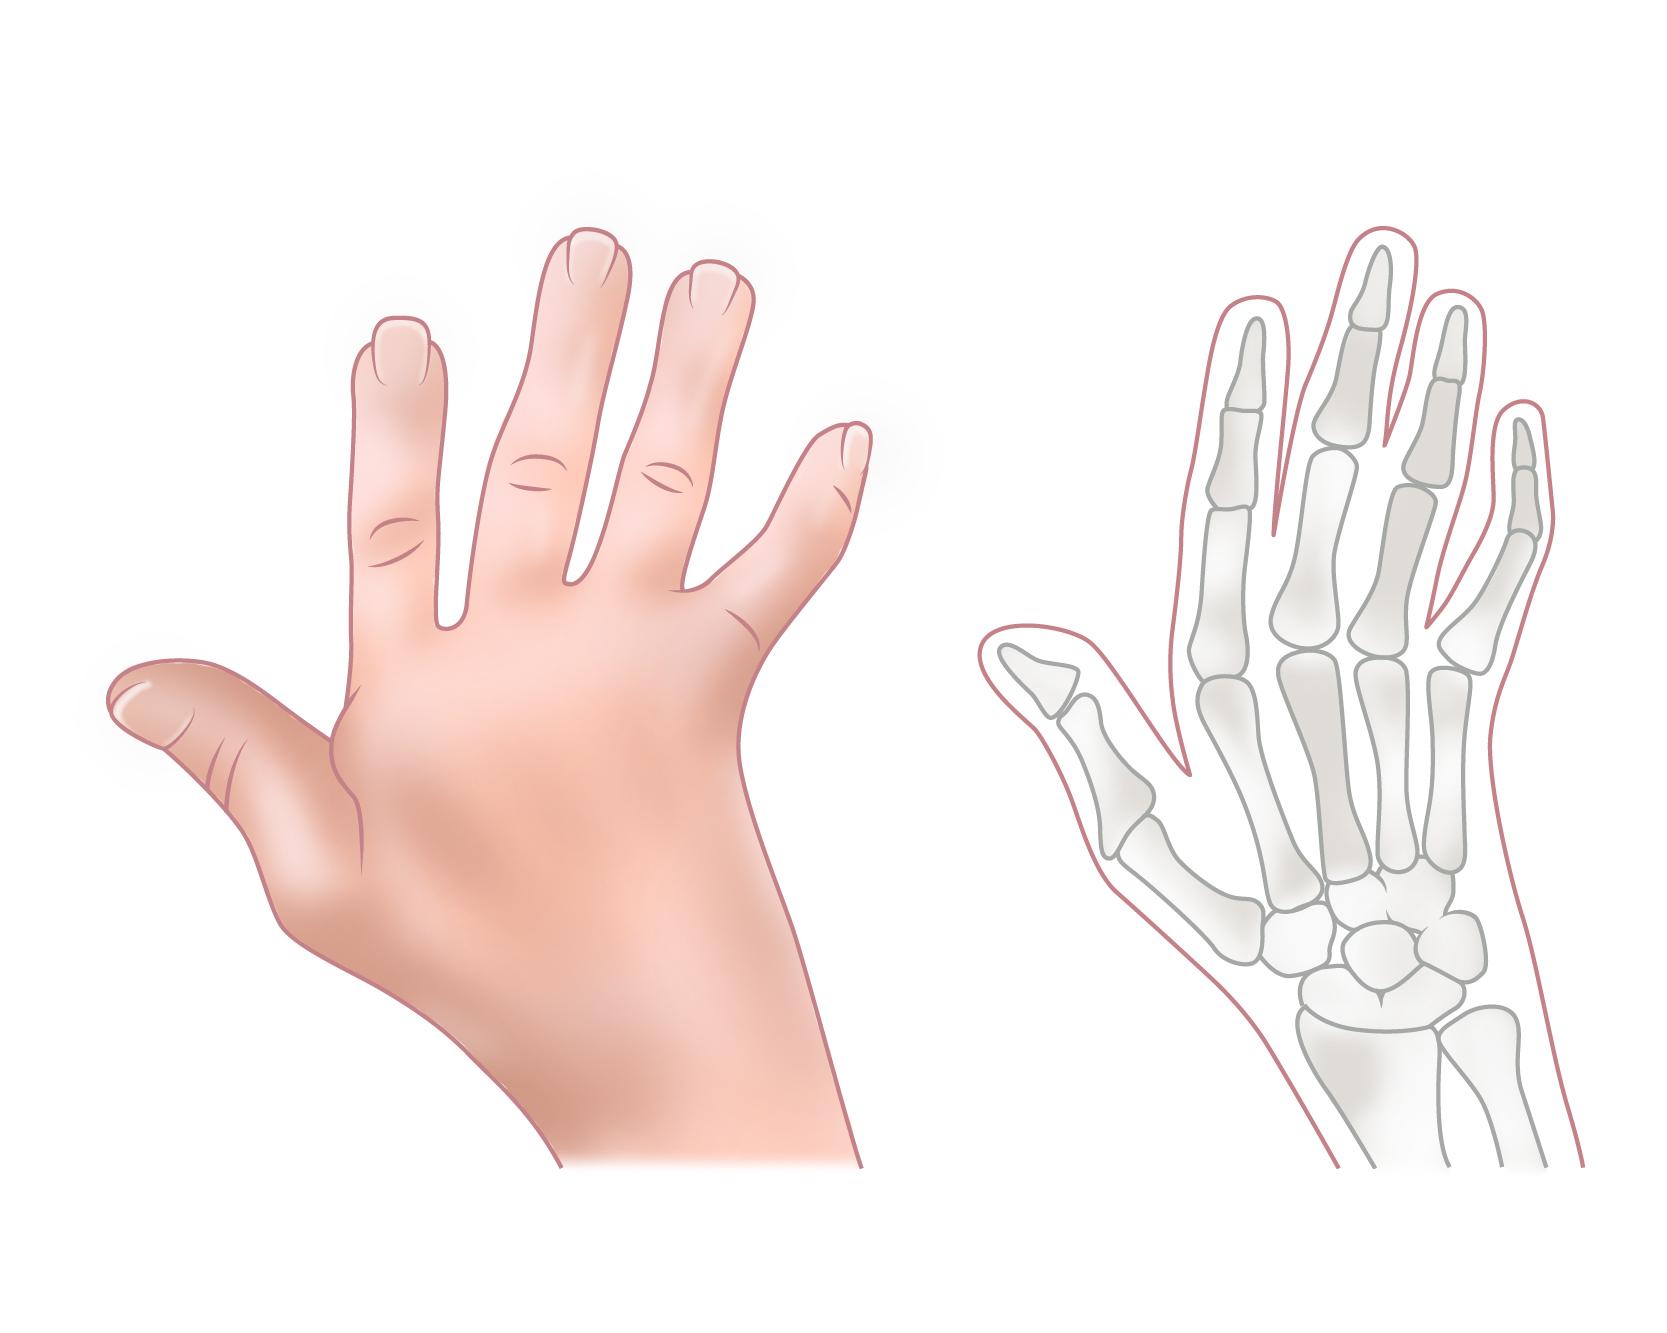 Jaccoud's Hand illustration